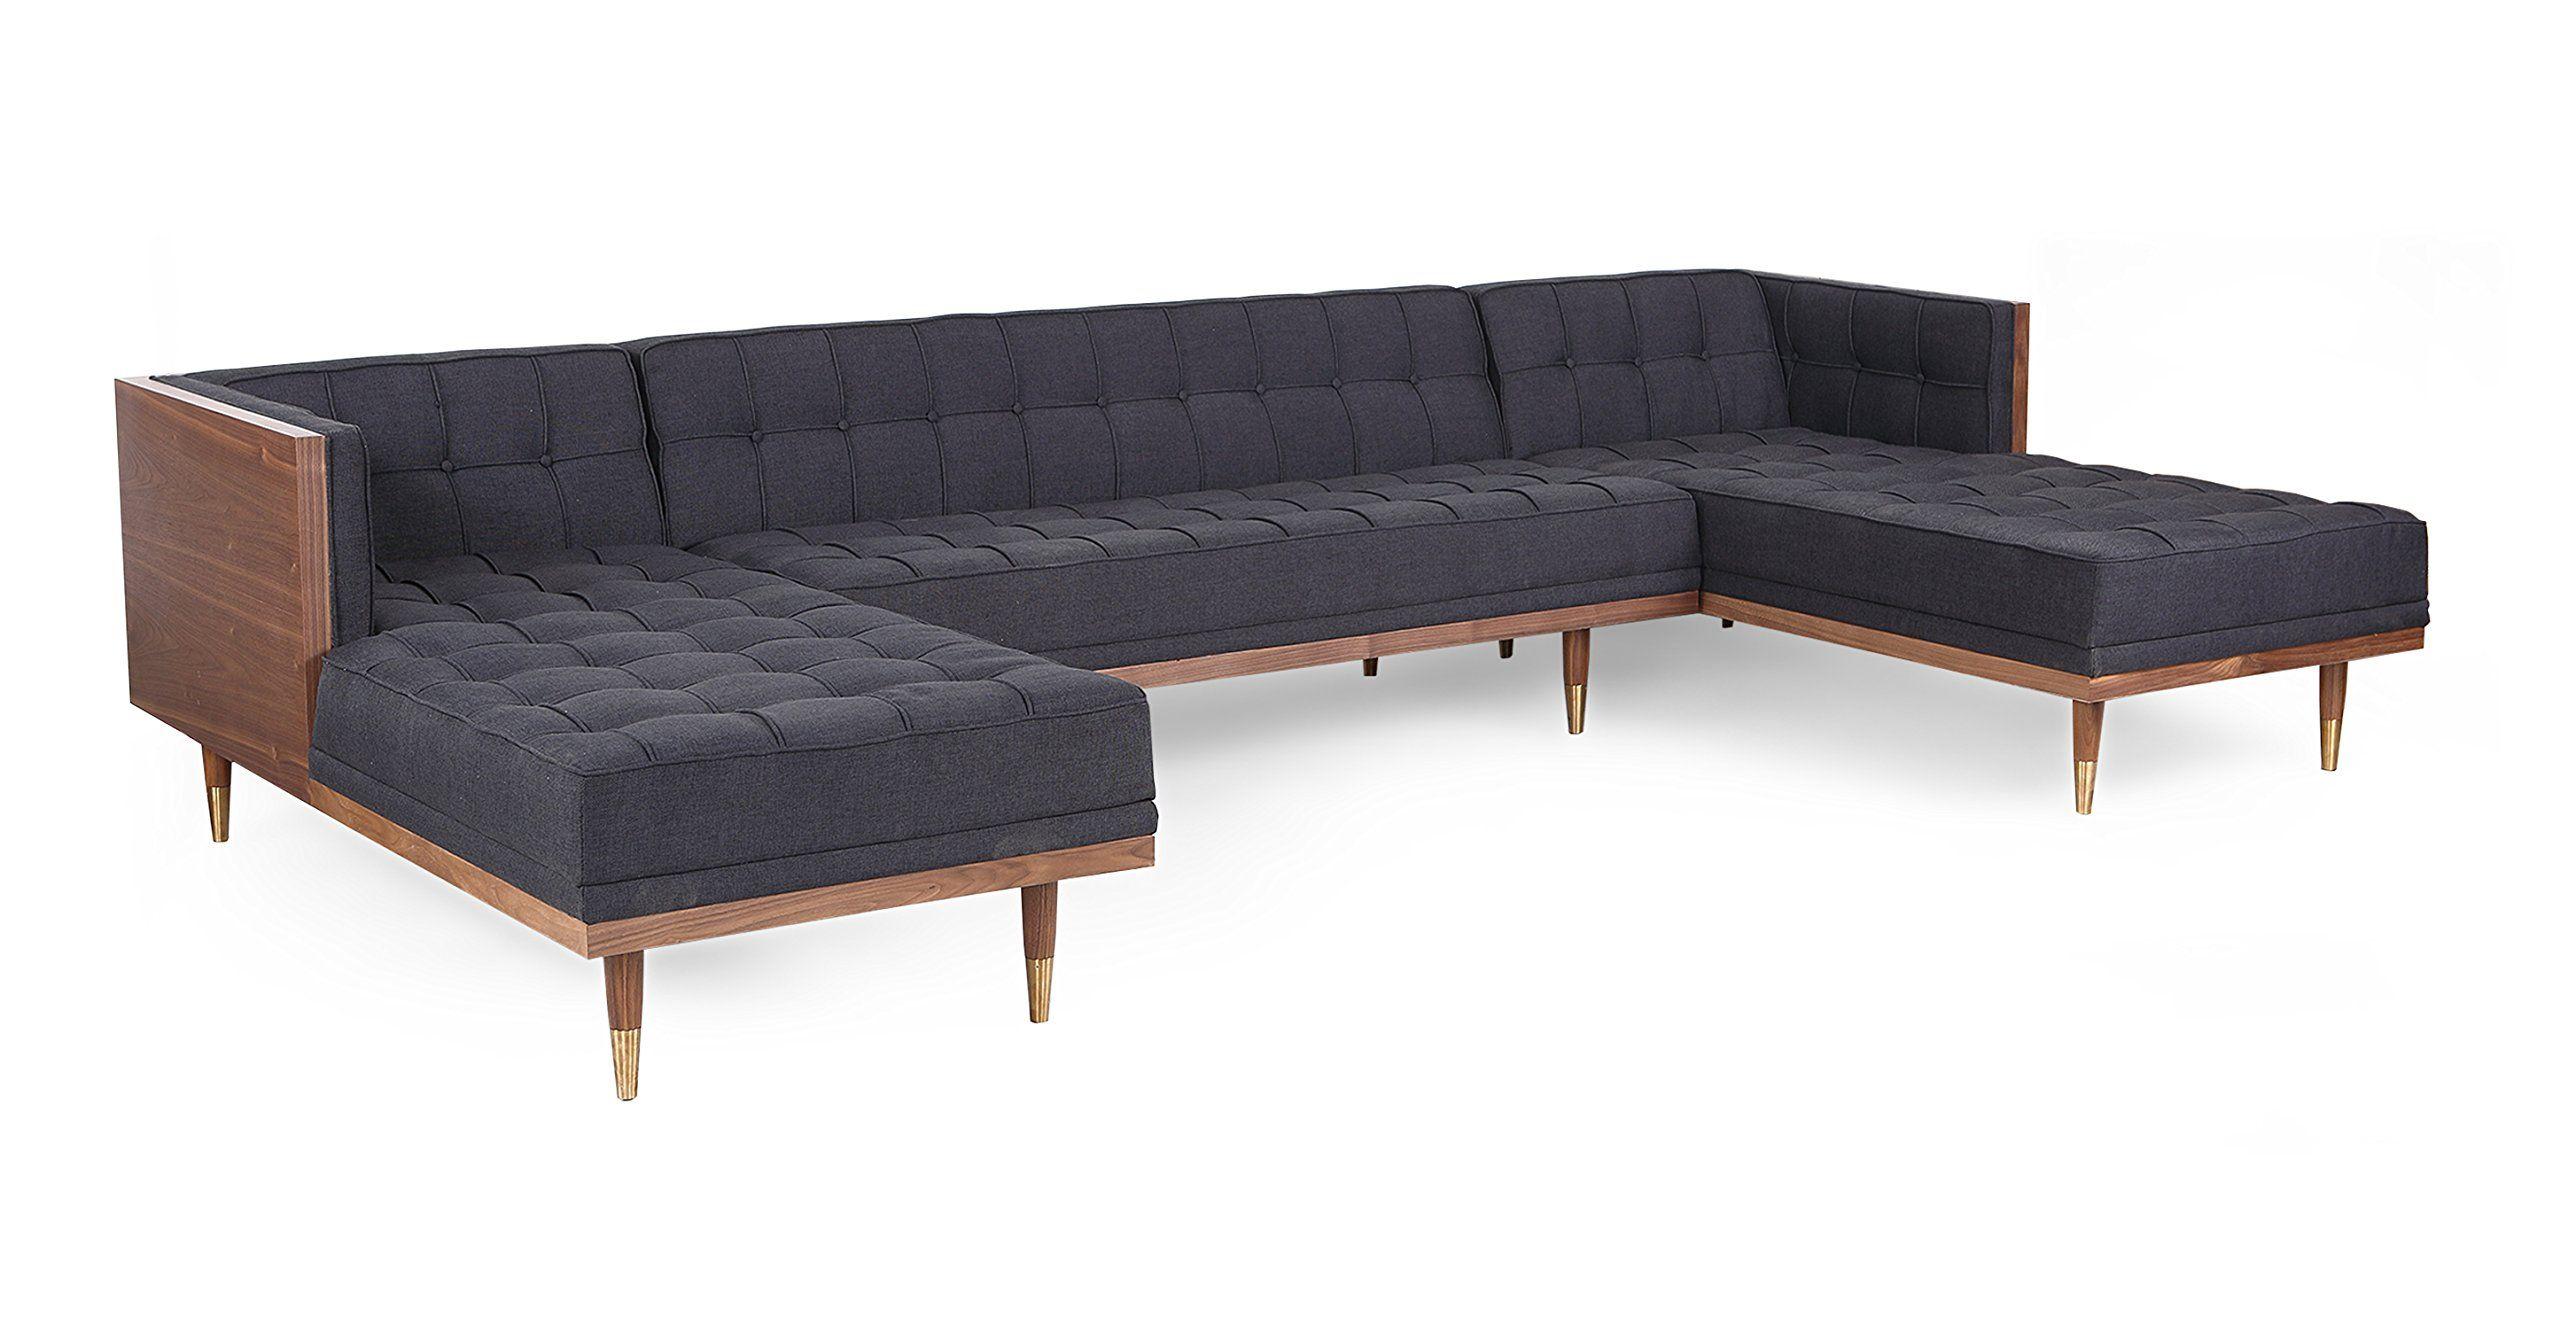 Awesome Kardiel Woodrow Midcentury Modern Box Sofa Ushaped Chaise Cjindustries Chair Design For Home Cjindustriesco